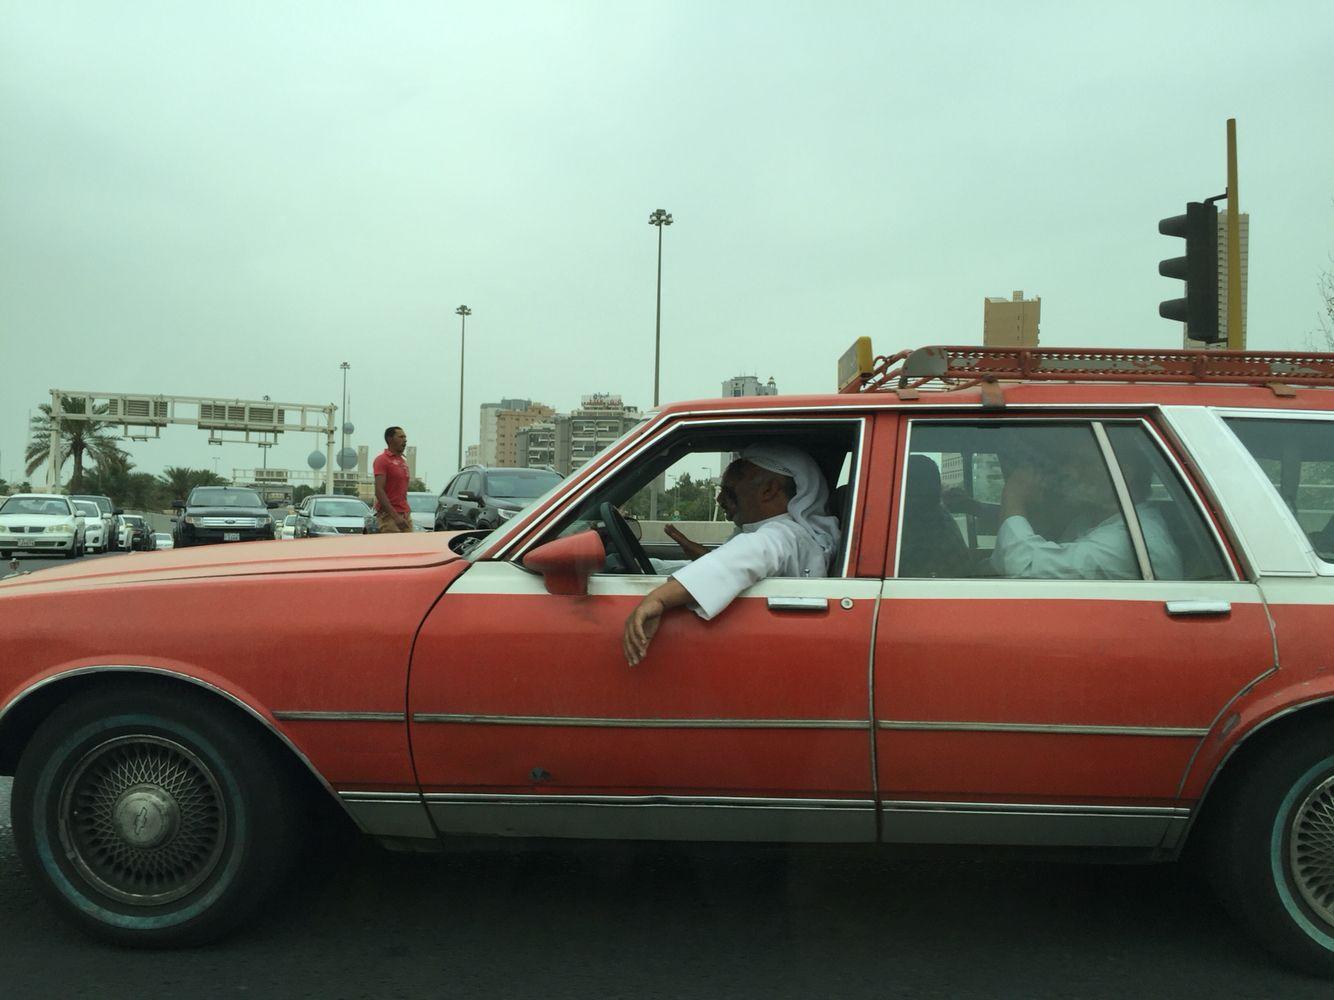 اللي ماله أول ماله تالي Old Is Gold Car Suv Suv Car